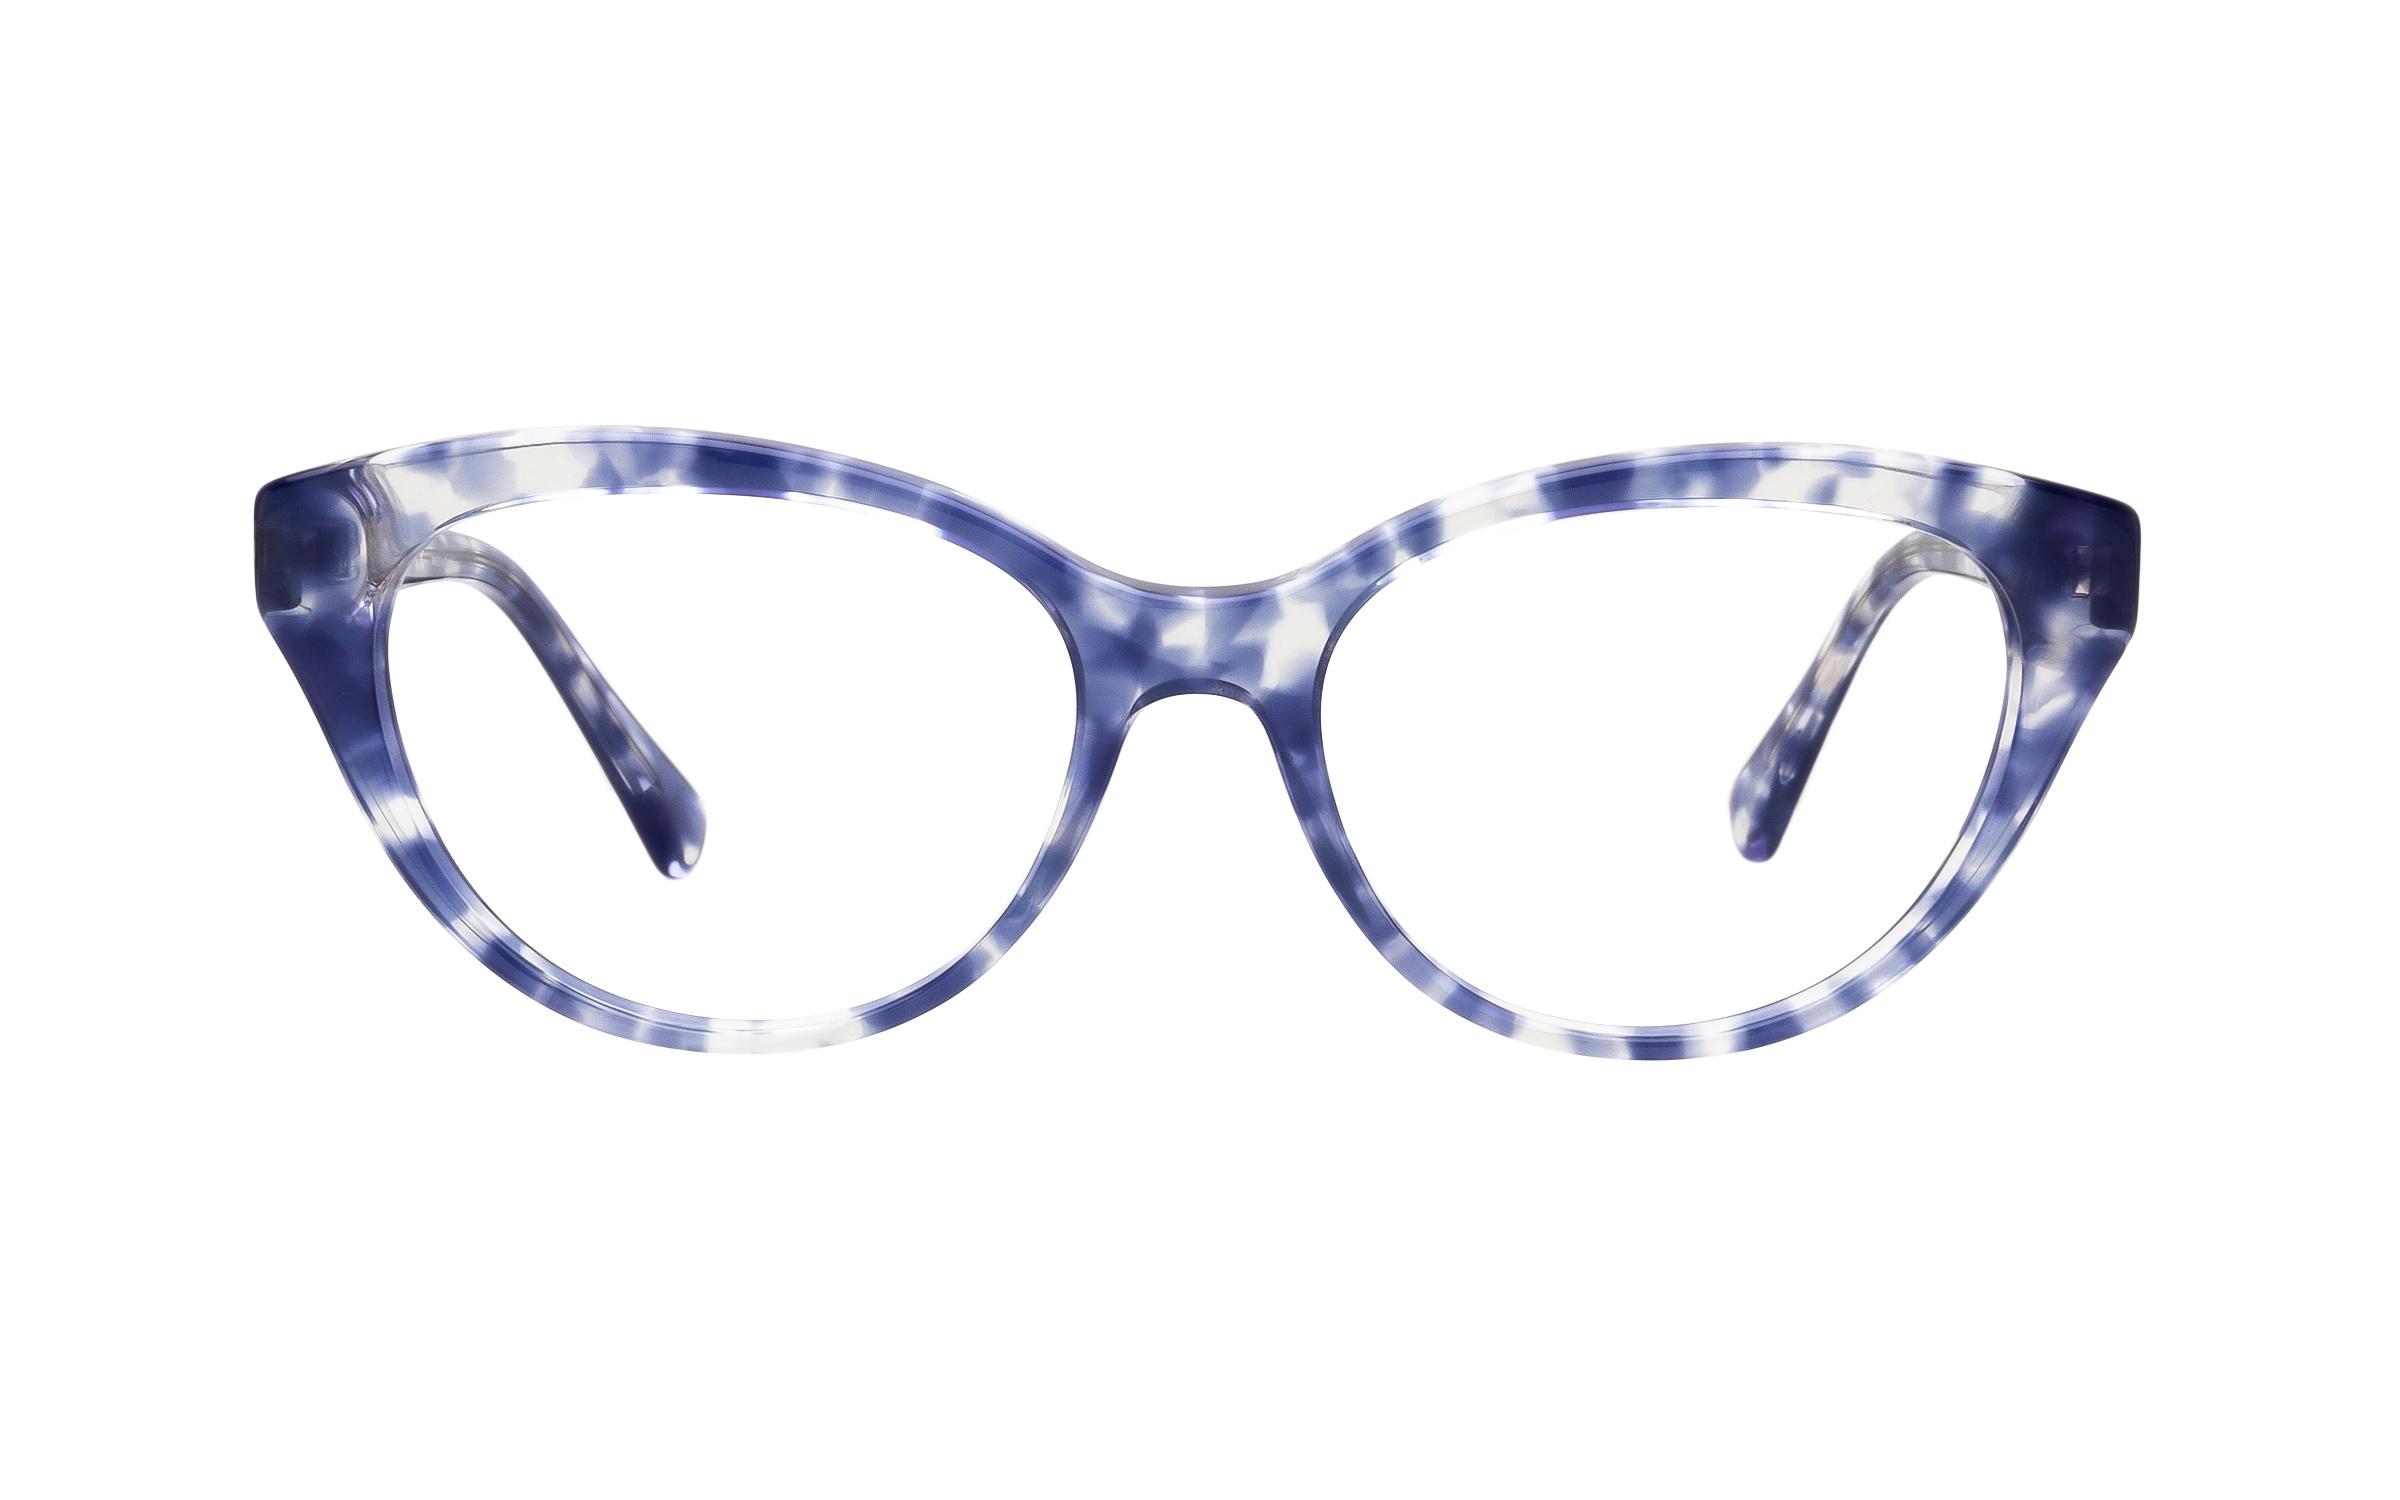 Luxottica Ralph by Ralph Lauren RA7116 5848 (52) Eyeglasses and Frame in Violet Havana Blue/Tortoise | Acetate - Online Coastal